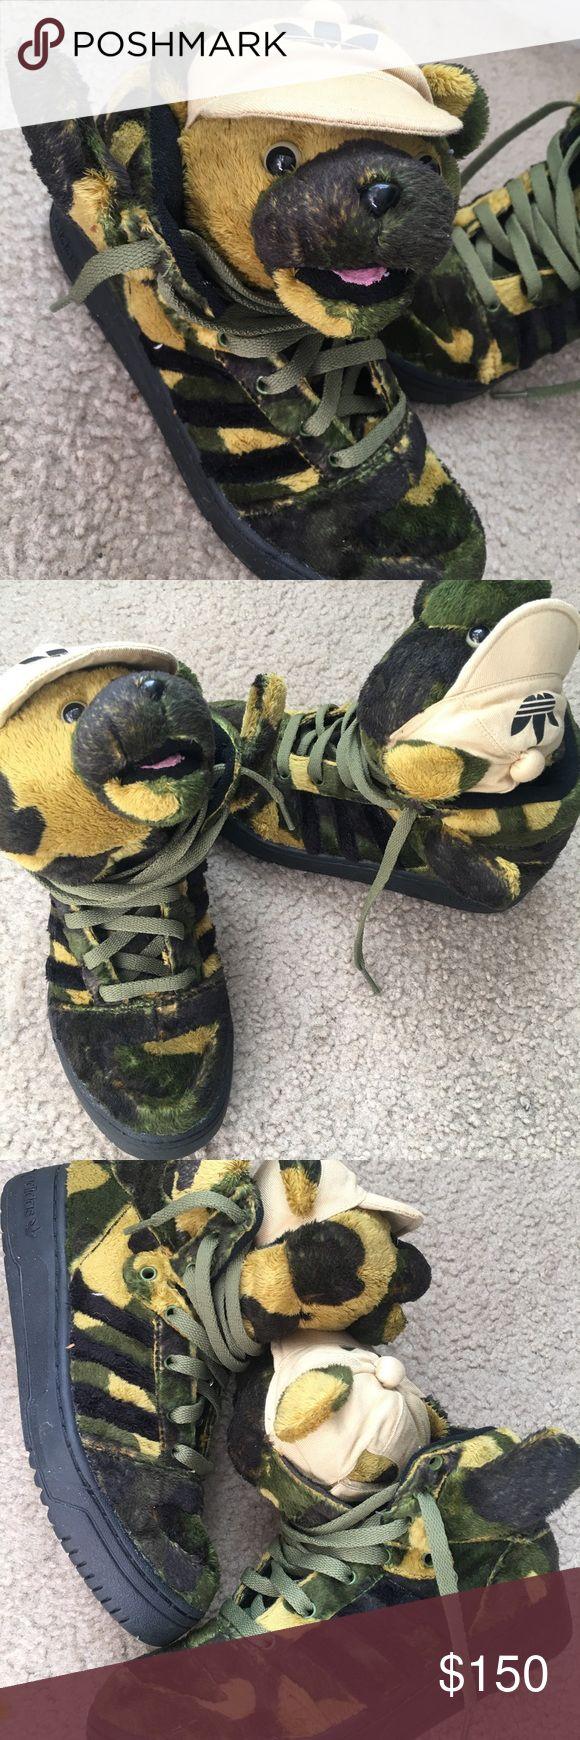 Jeremy Scott adidas camo sz 5.5 Size 5.5, brand new, rare Adidas Shoes Sneakers